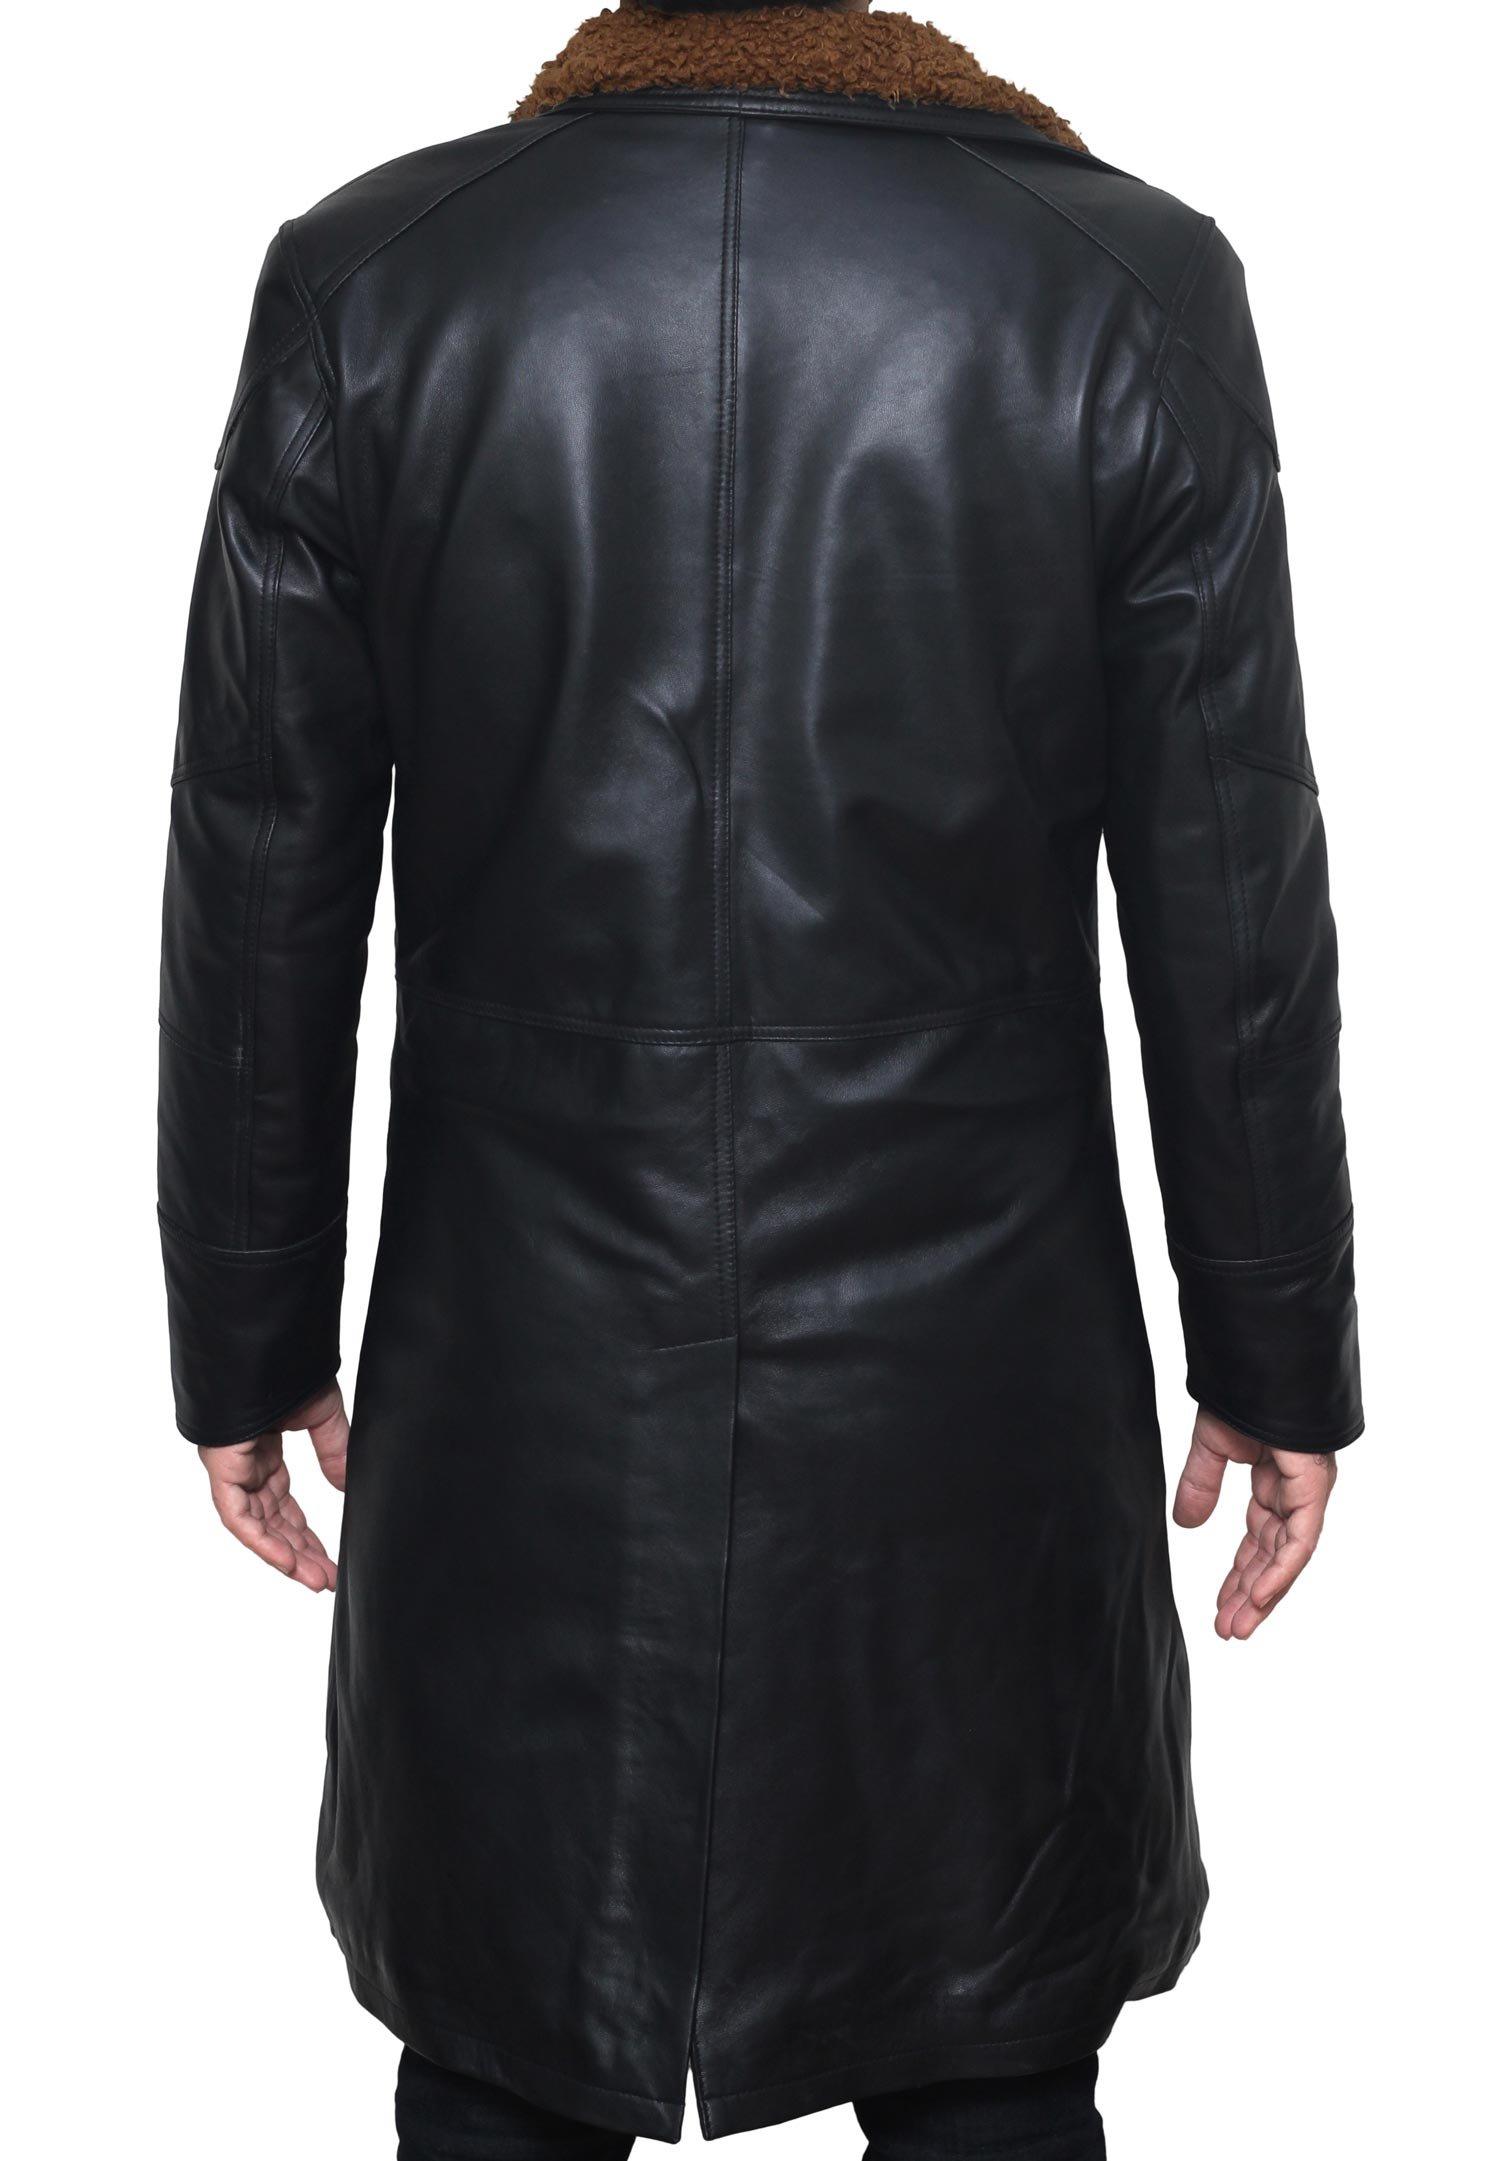 BlingSoul Blade Fur Coat Men Costume - Boys Black Leather Coat (XL) [PU-BLRN-BL-XL] by BlingSoul (Image #4)